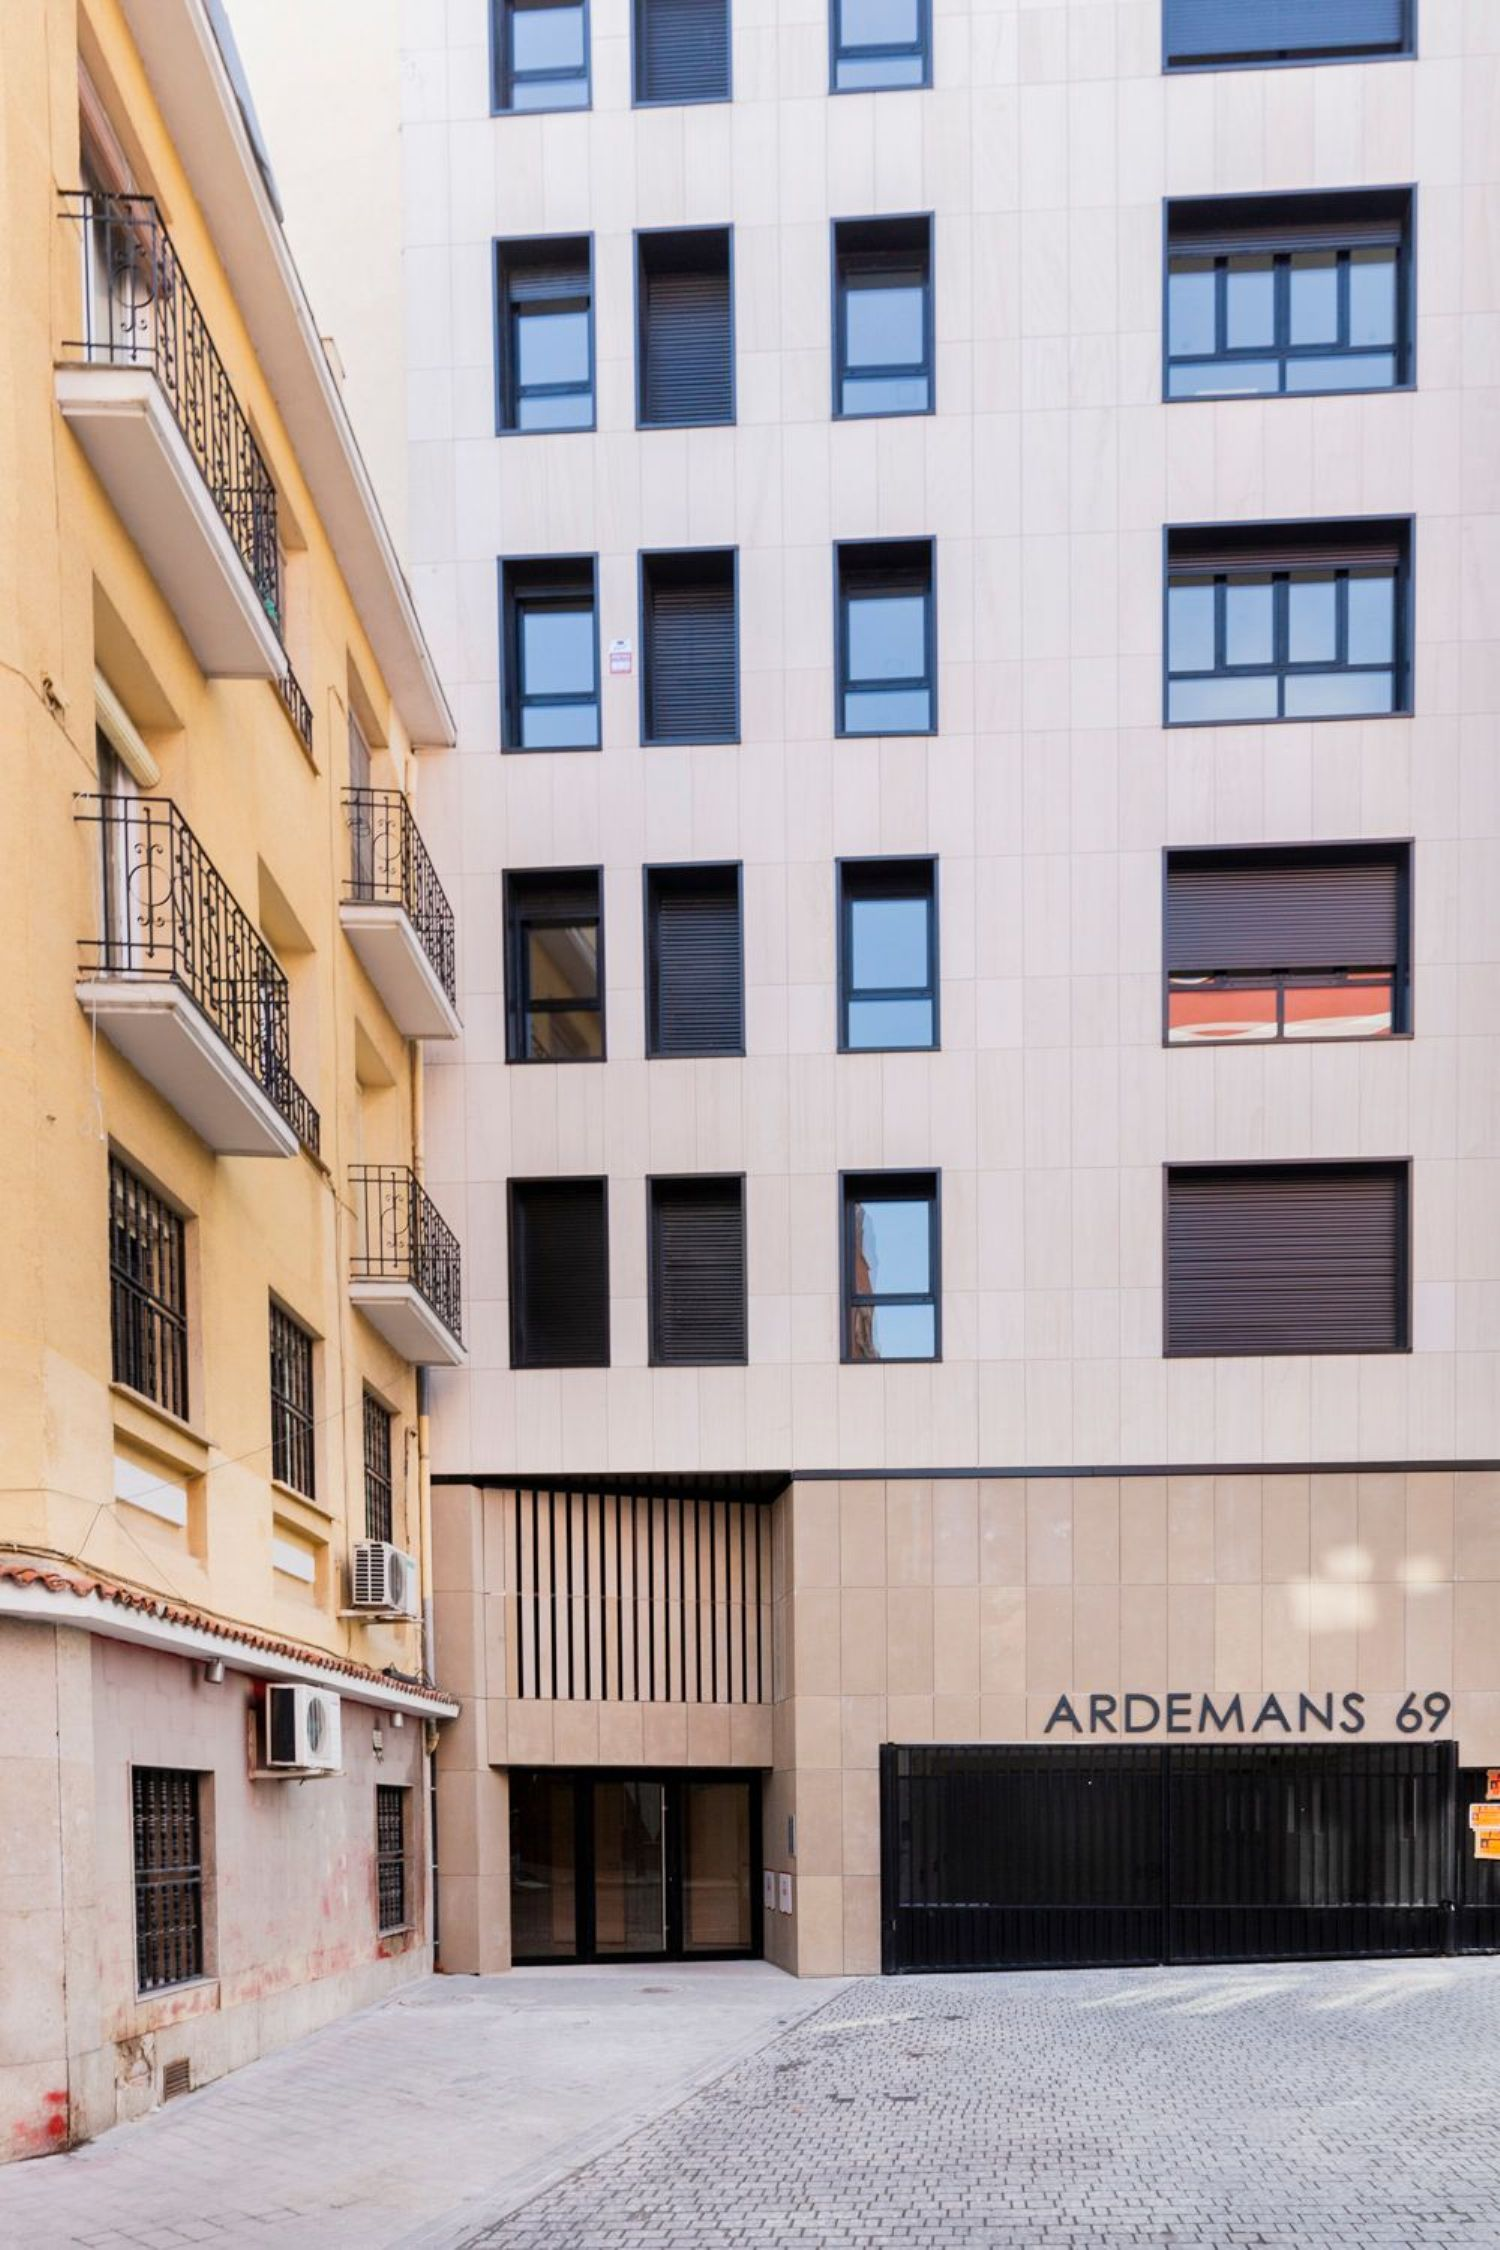 Piso en alquiler en Madrid capital, Madrid 39 thumbnail